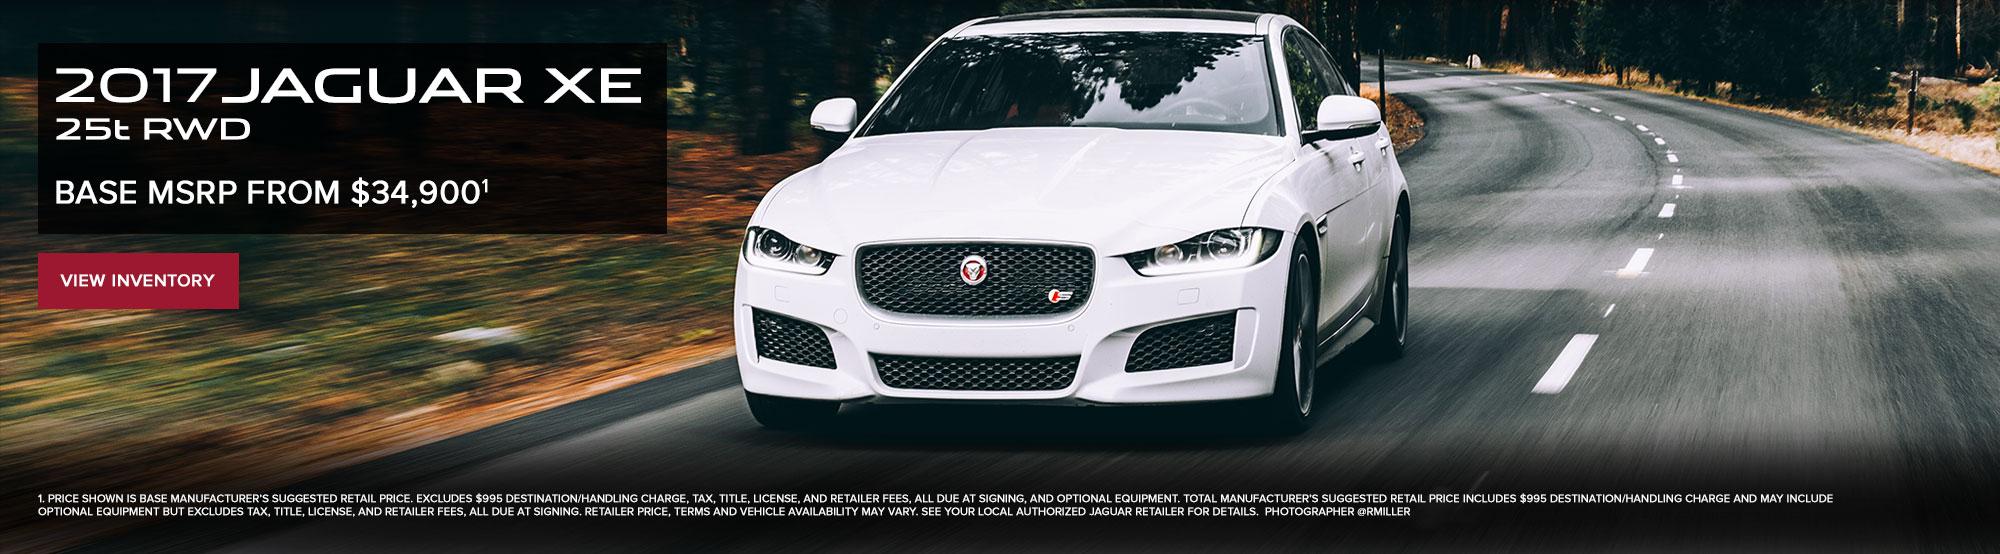 West Herr Jaguar >> Jaguar Austin   New & Used Jaguar Dealership